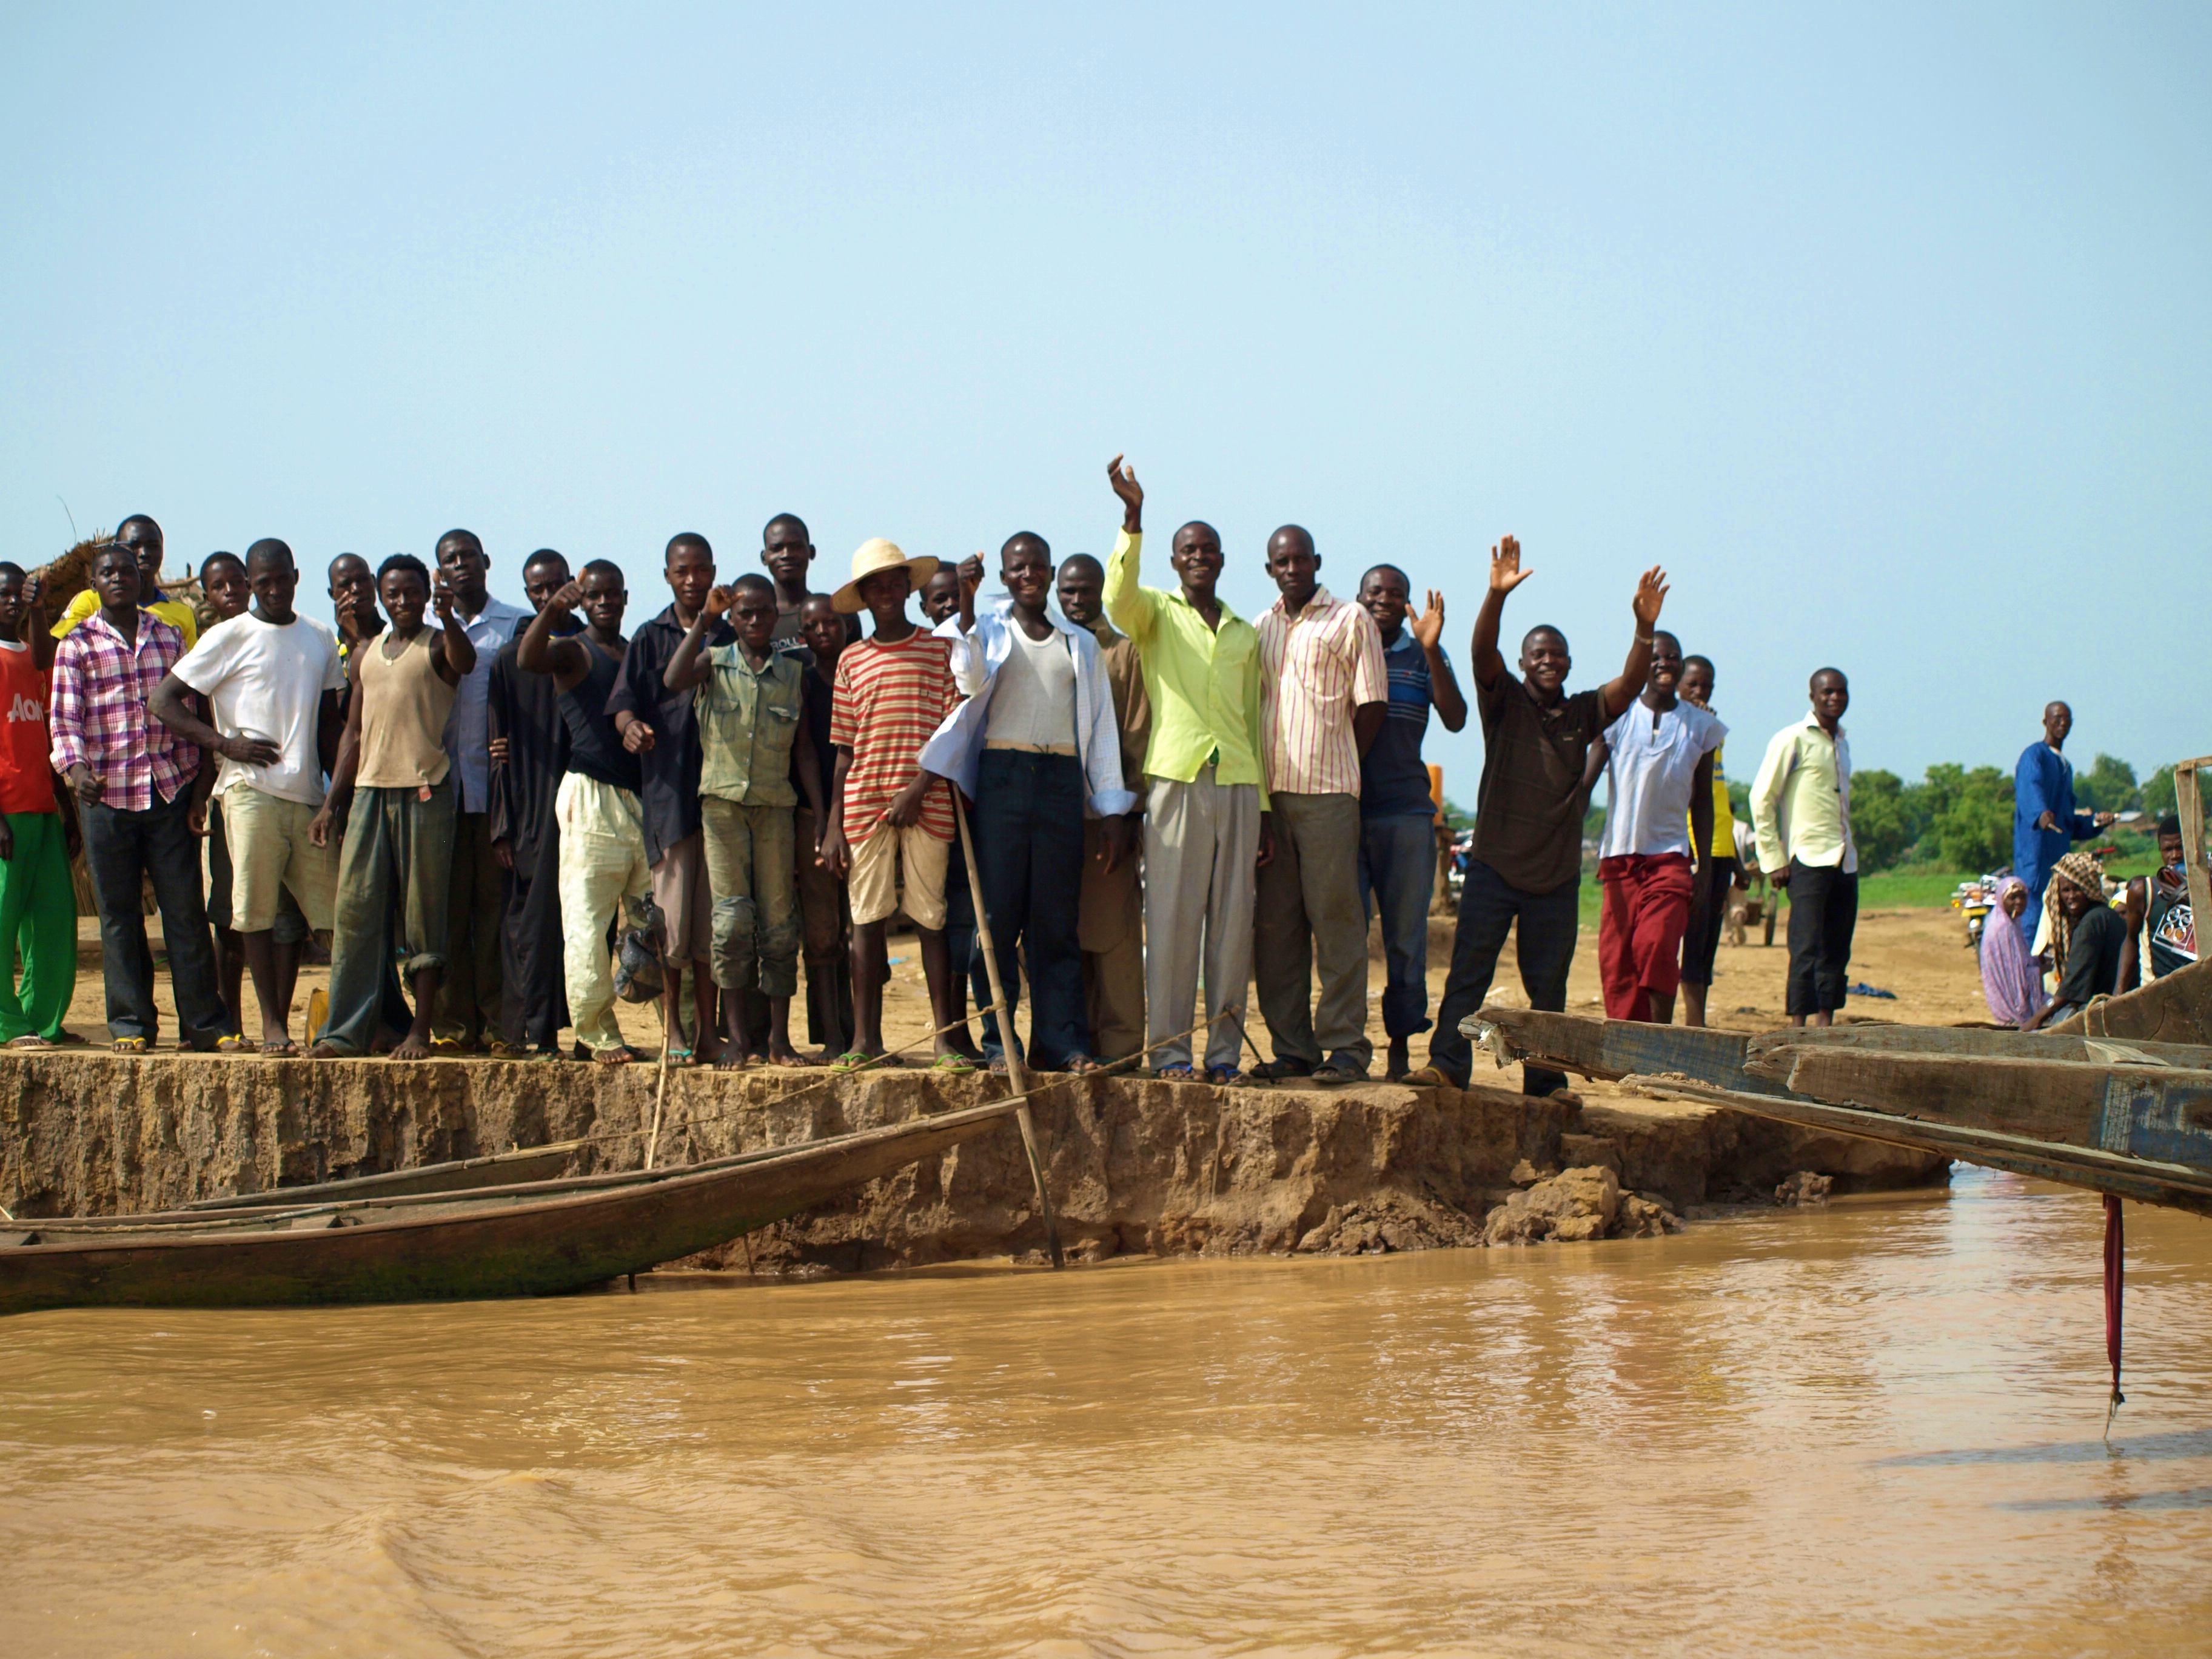 Cruzando la frontera de Benin a Nigeria